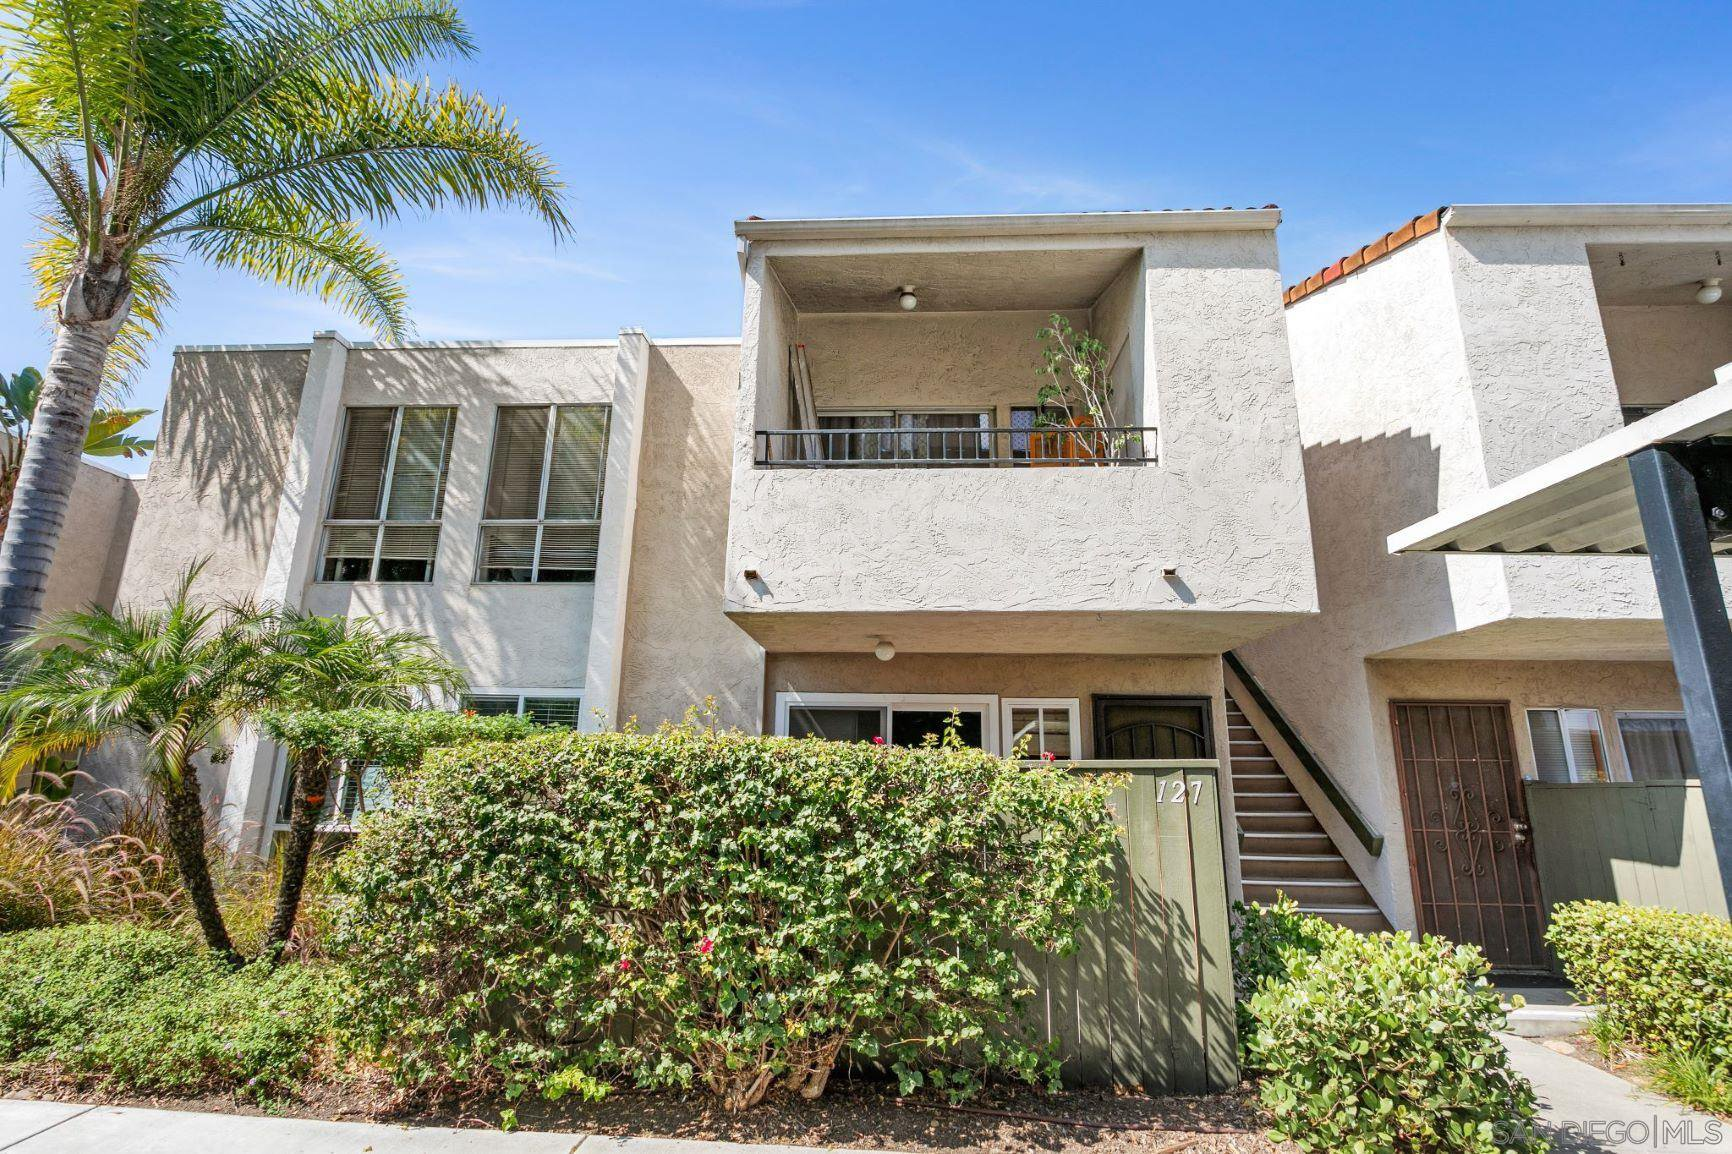 Main Photo: SERRA MESA Condo for sale : 3 bedrooms : 3591 Ruffin Rd #127 in San Diego